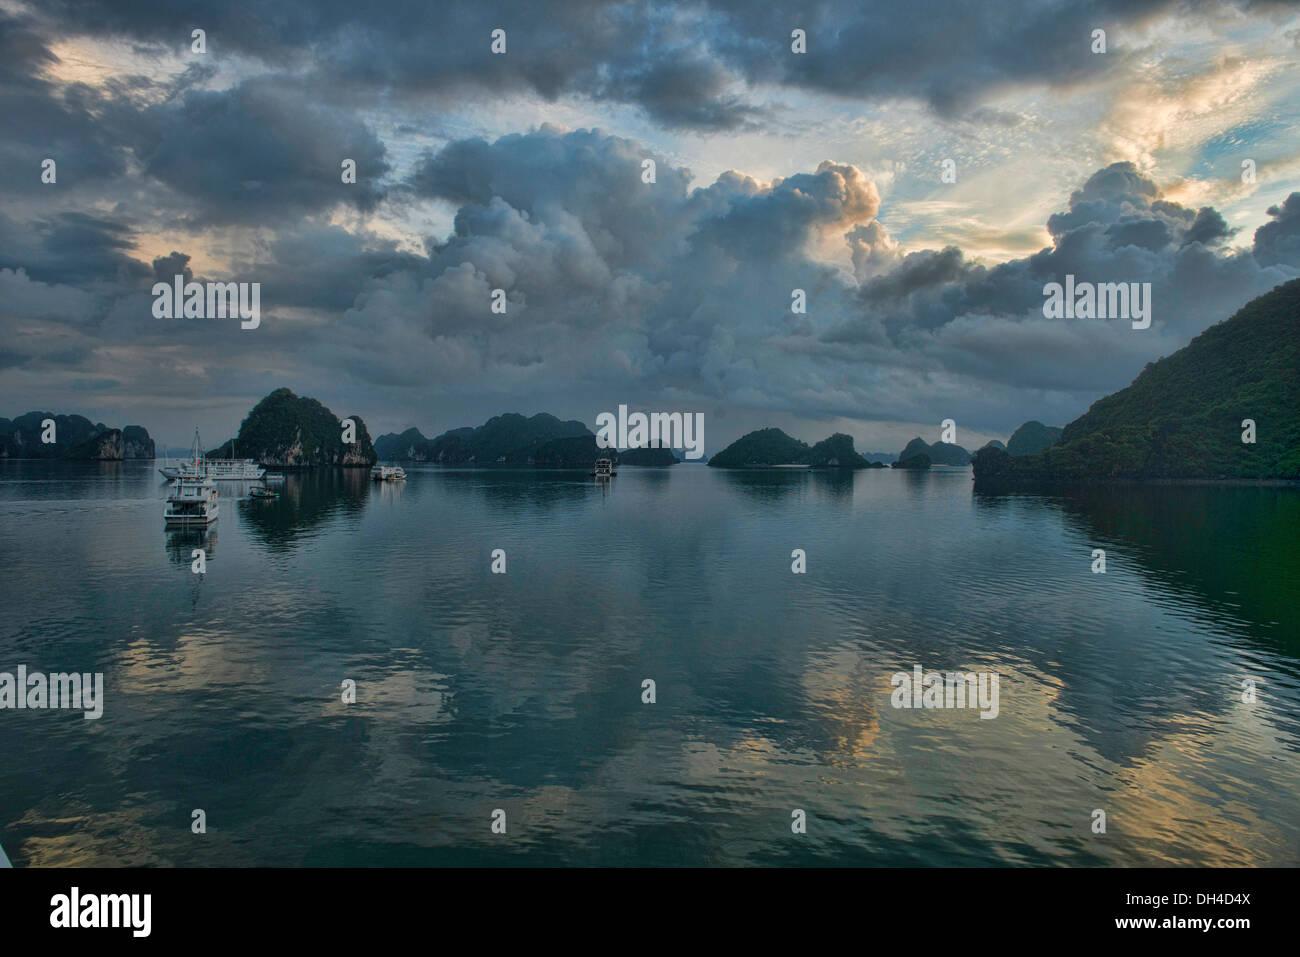 traditional junk sailing in Halong Bay, Vietnam - Stock Image